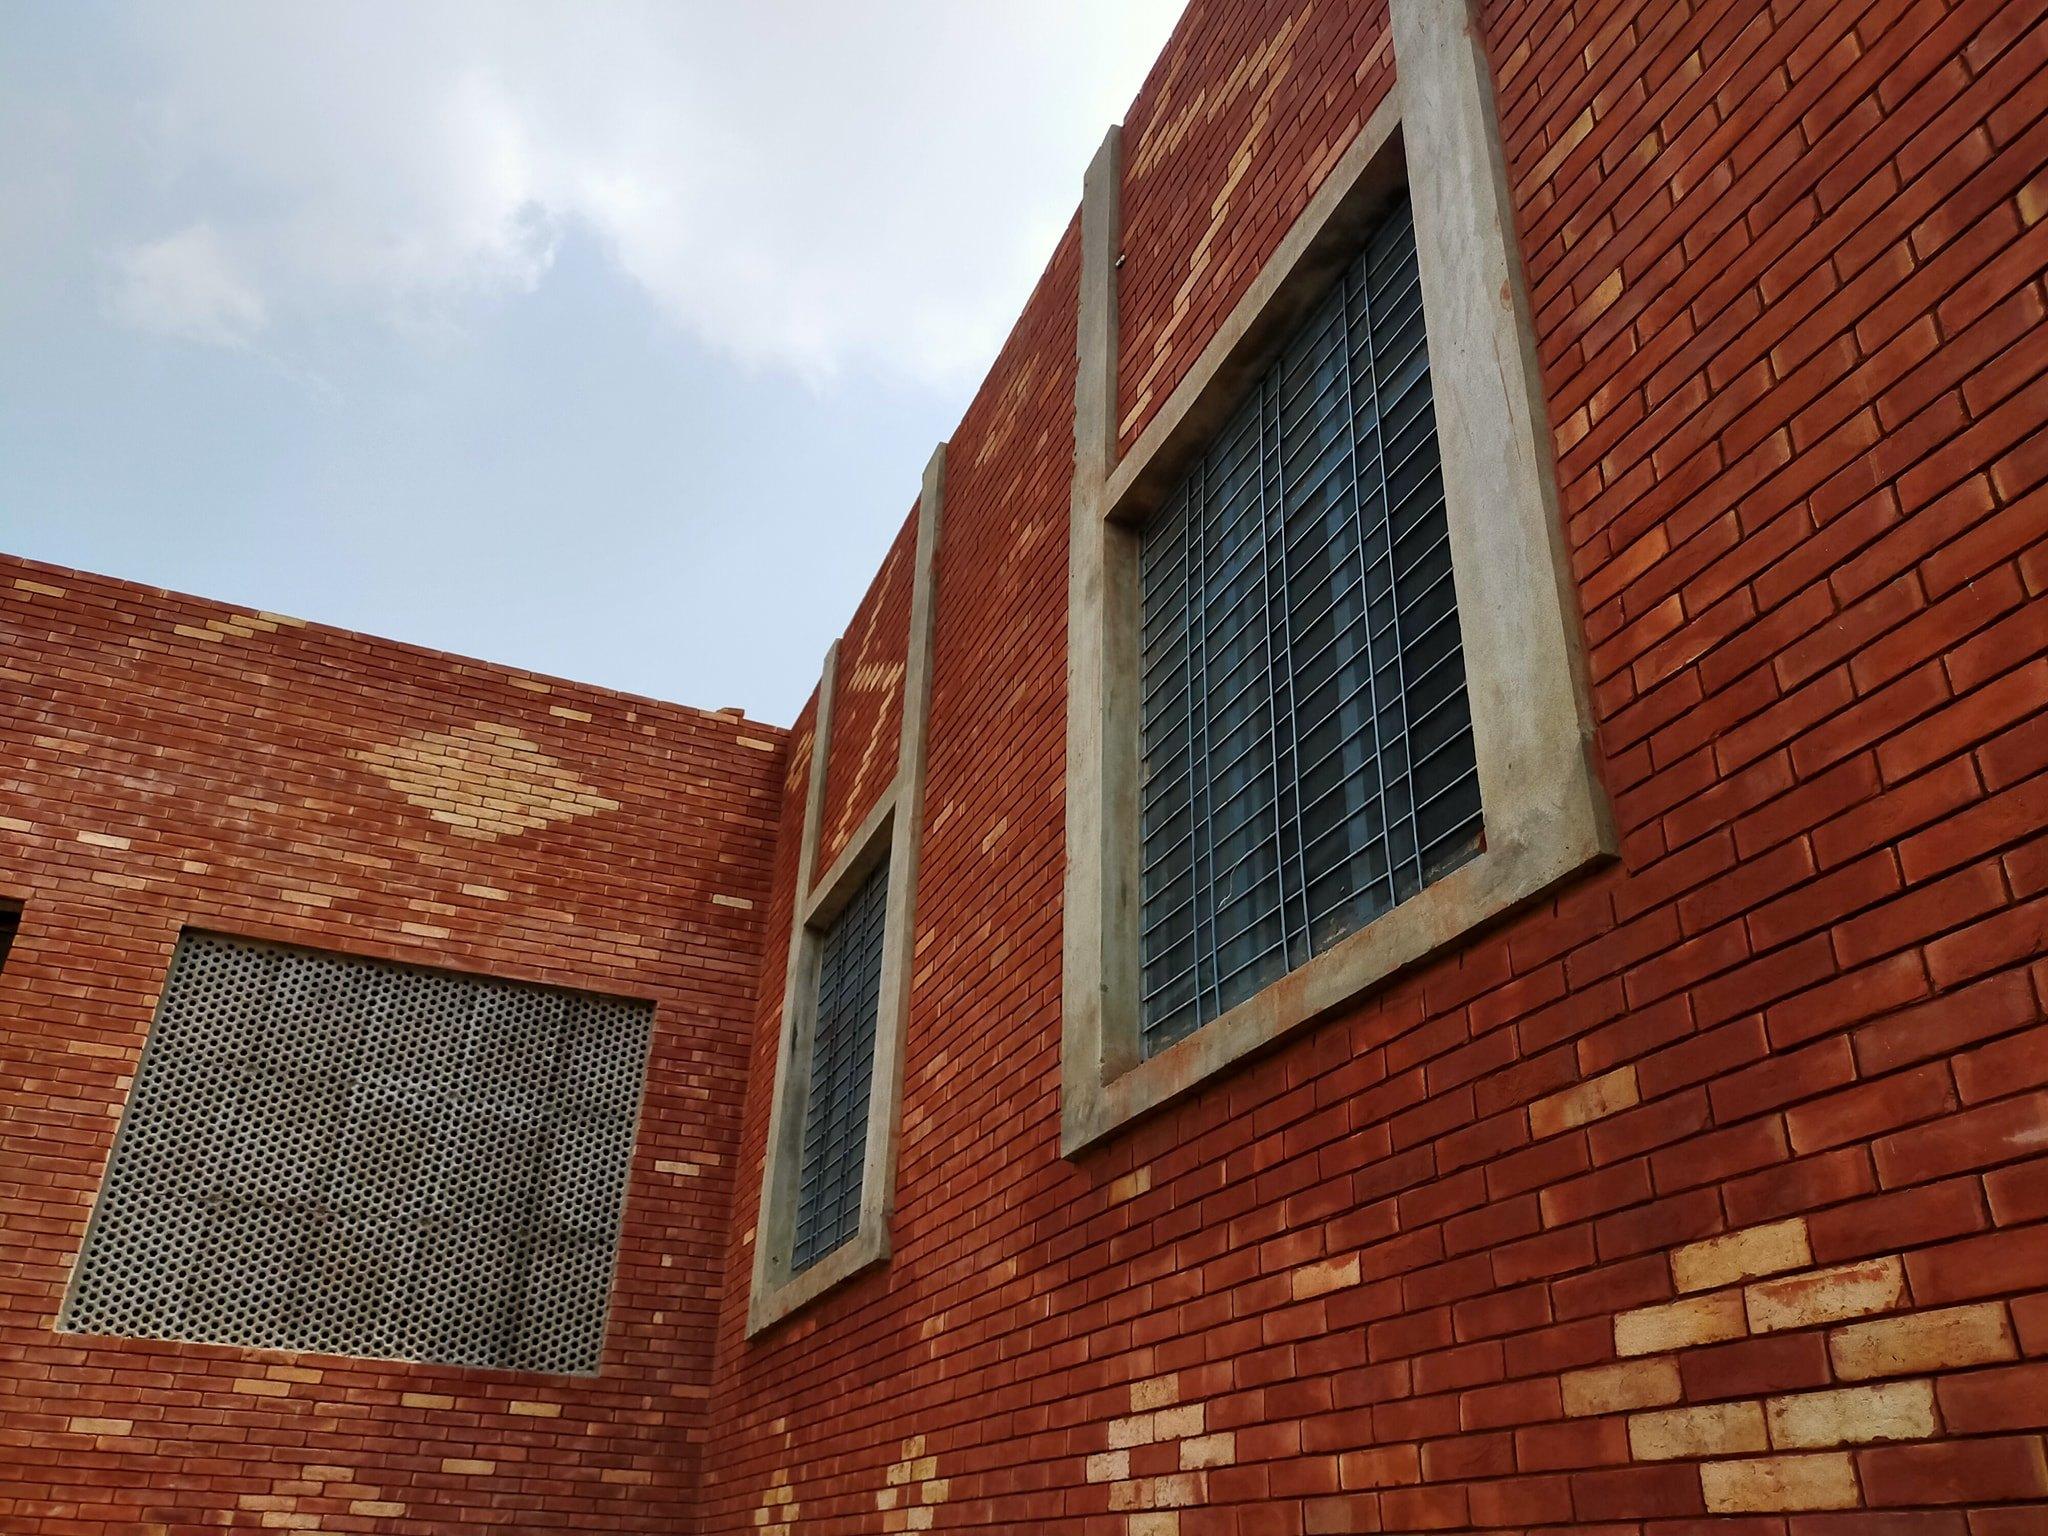 9 Lahori gutka bricks facing tiles in pakistan